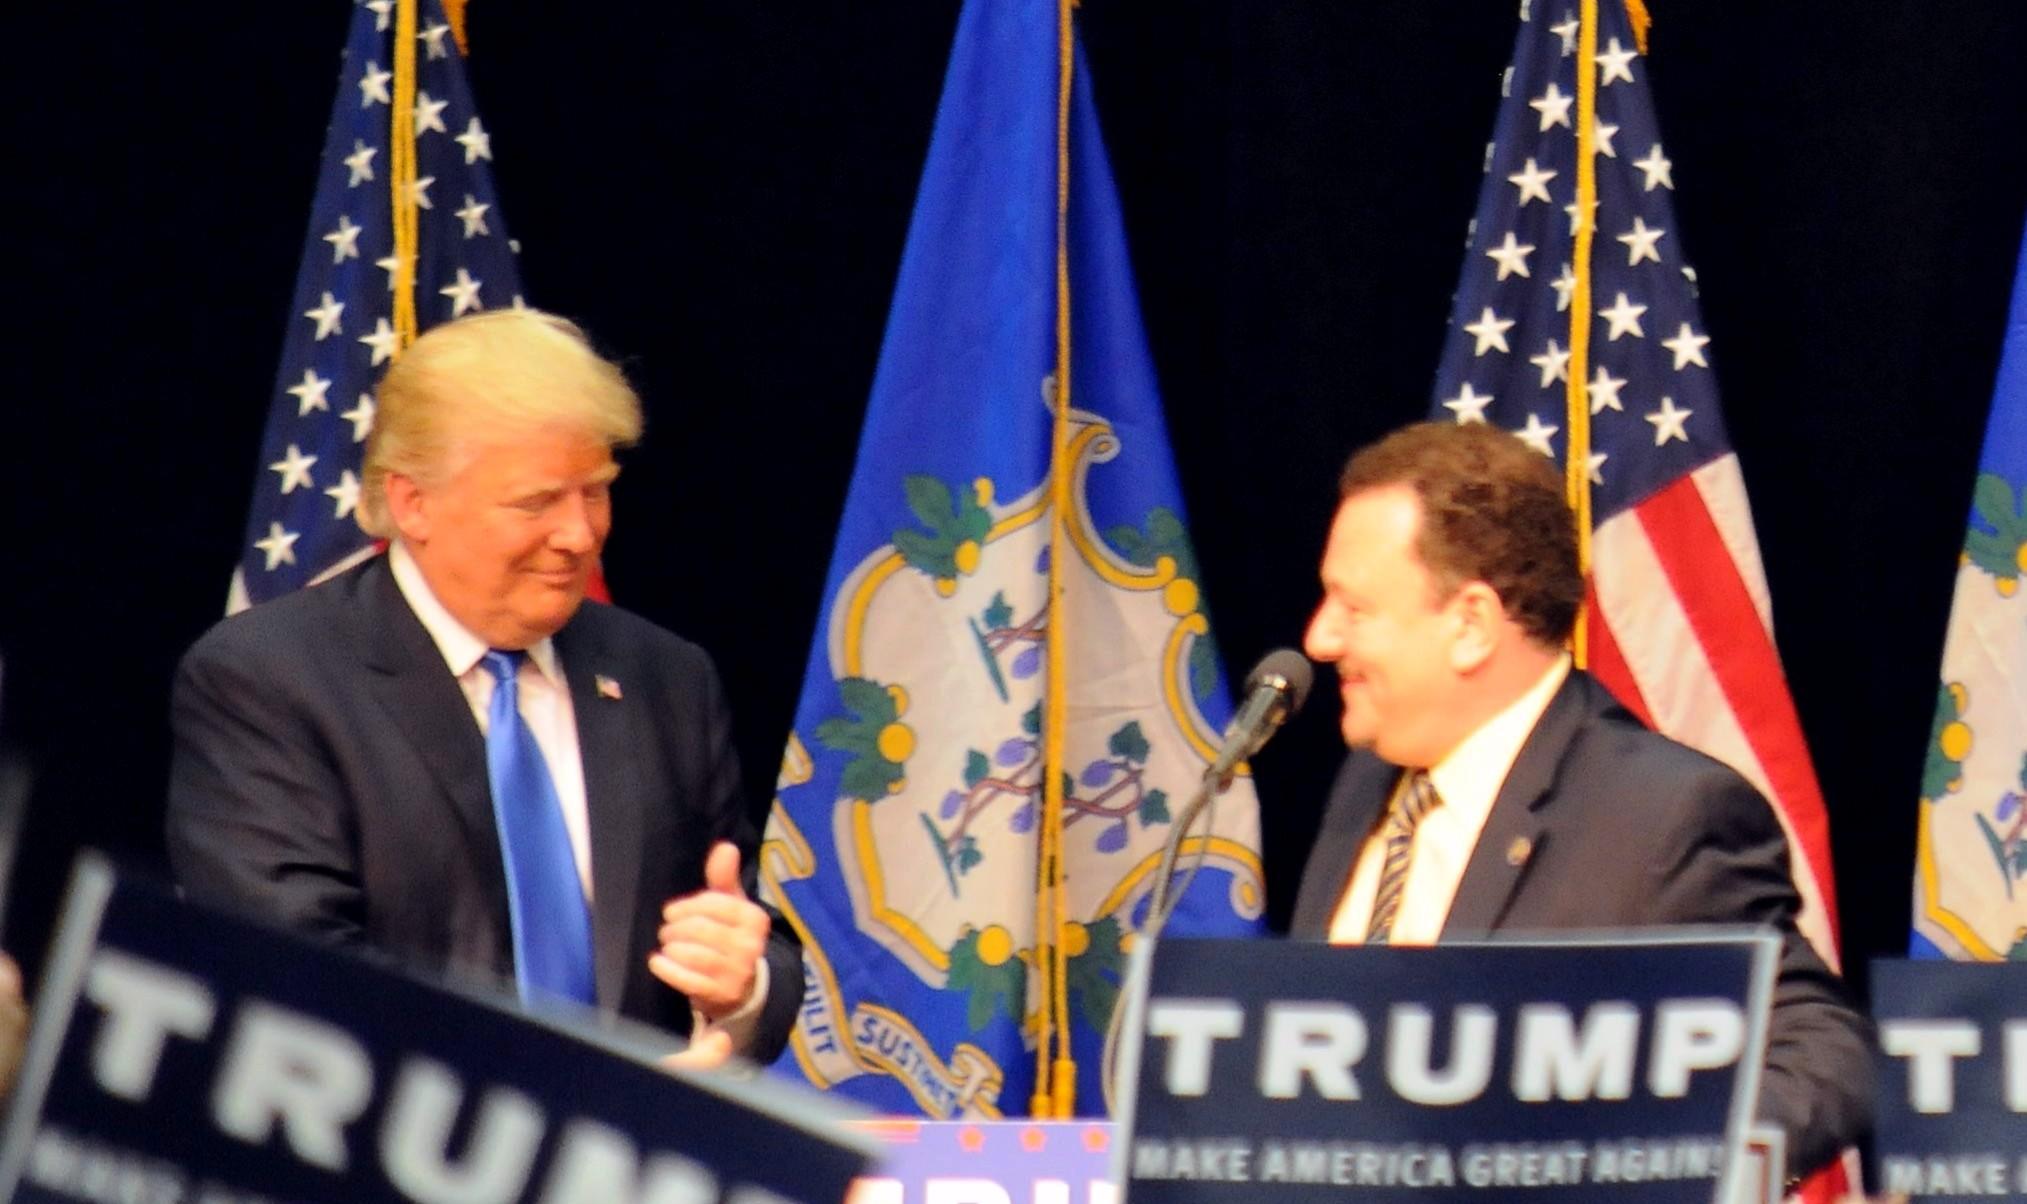 Establishment well-represented among Trump's CT delegates